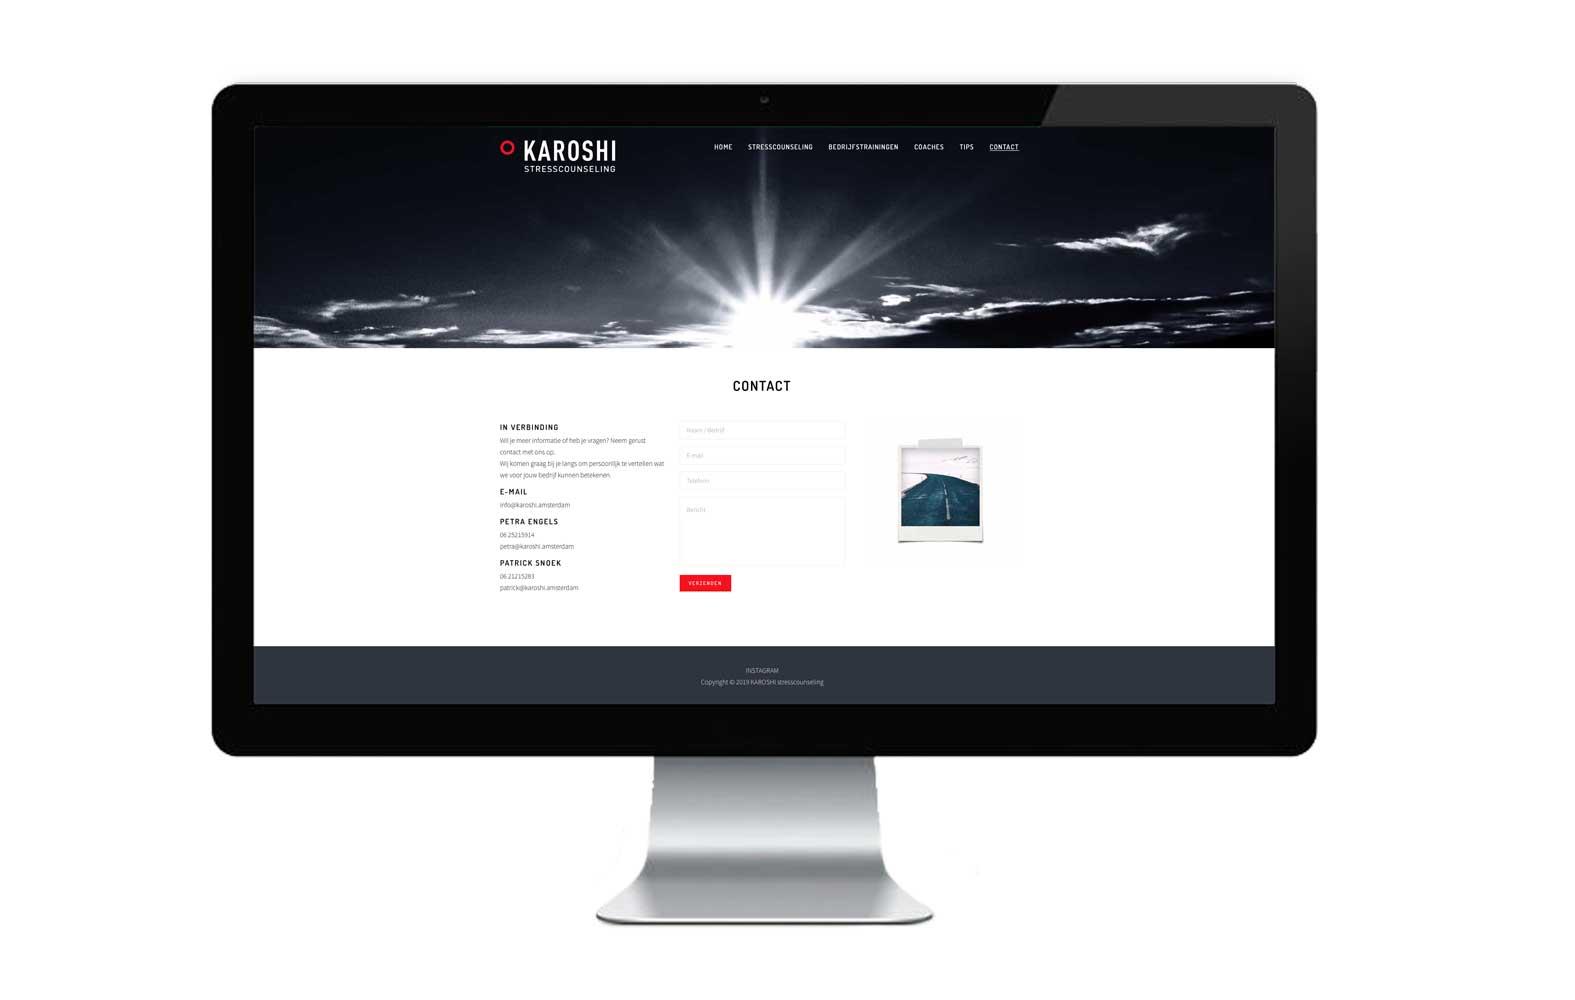 StudioErnst-WebDesign-Karoshi6